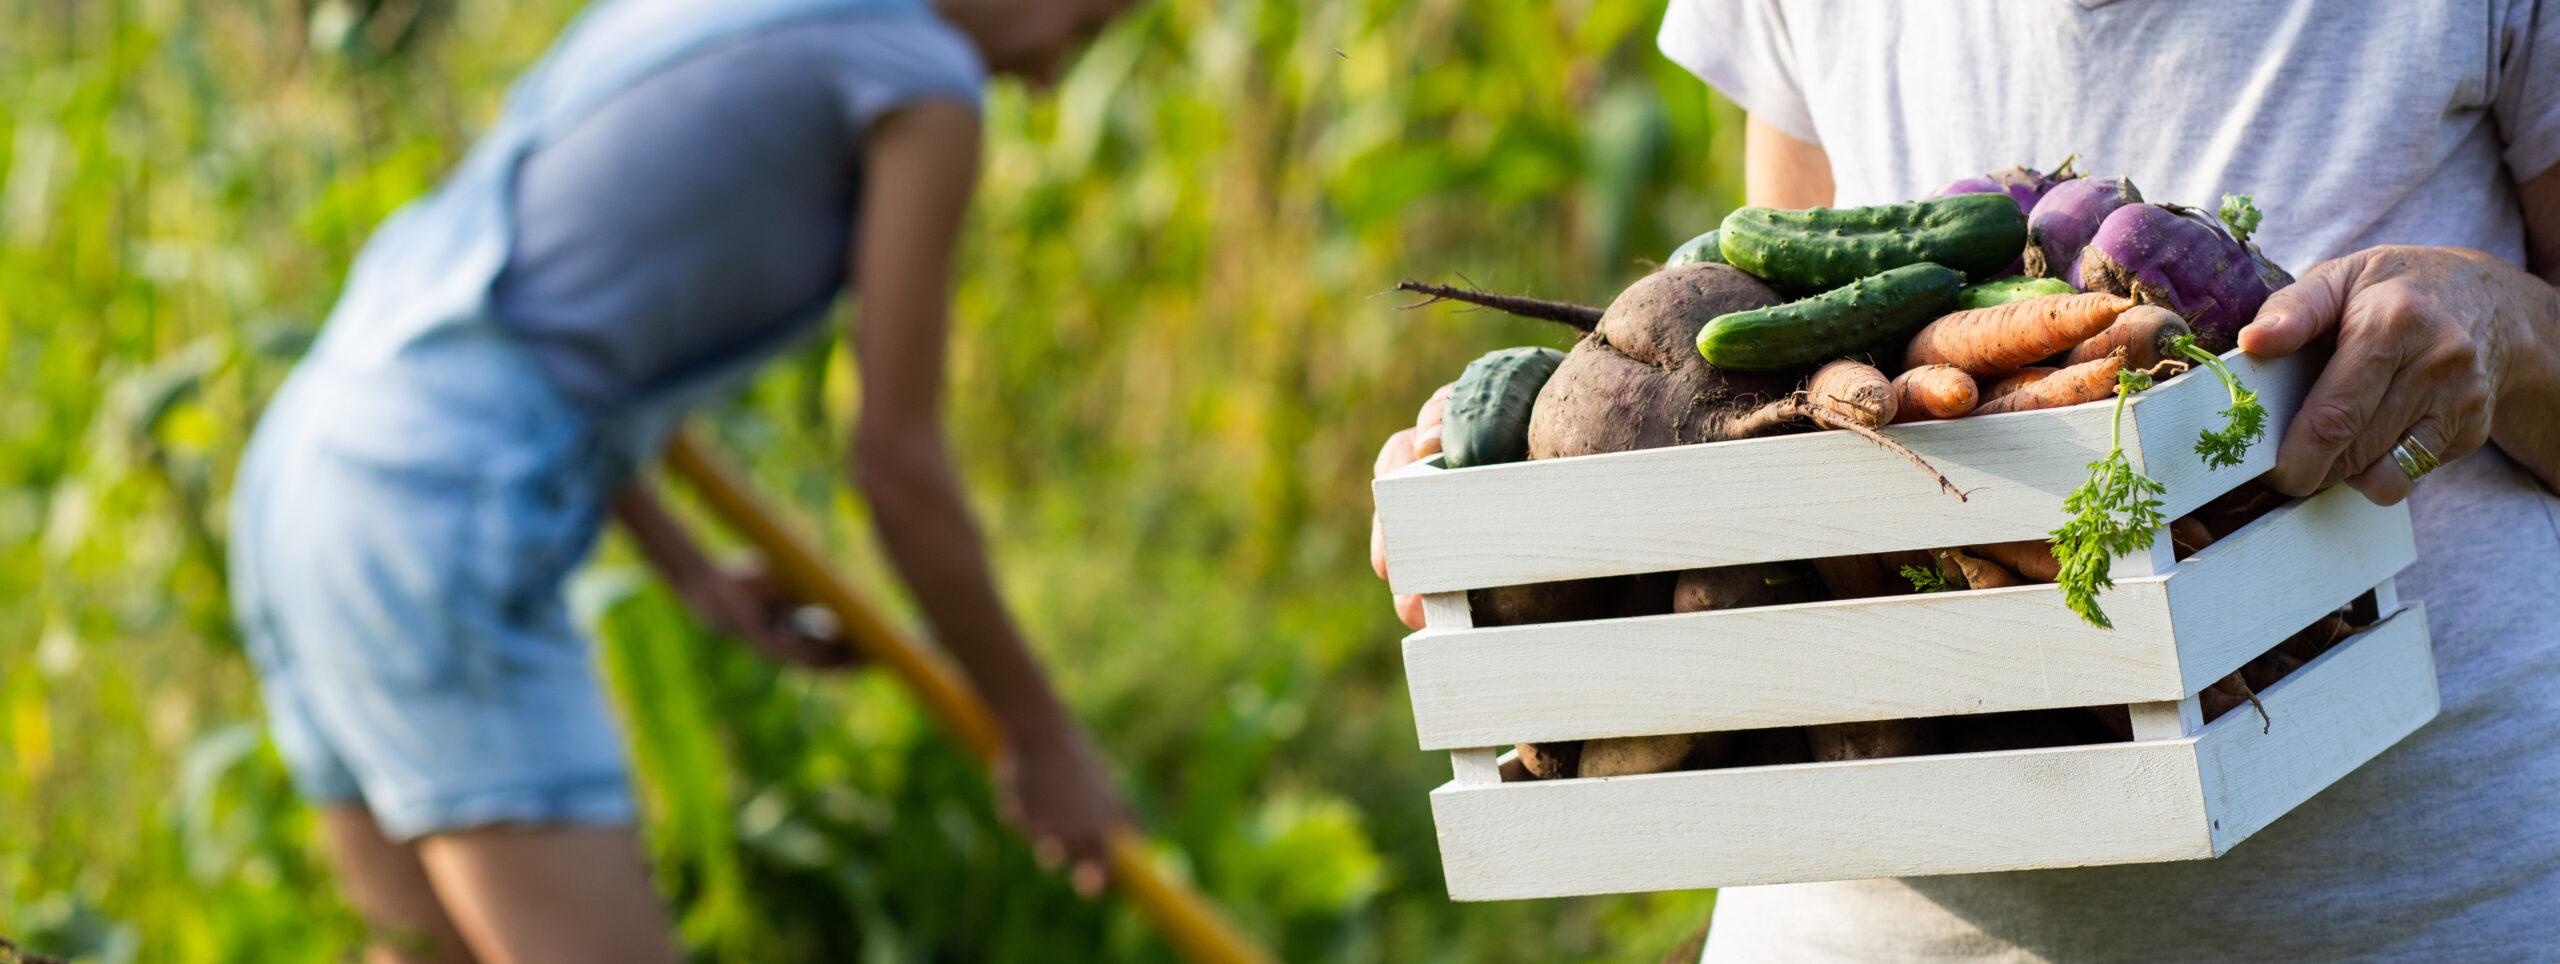 growing organic food female farmer harvesting fresh vegetables from garden, beetroot, carrots, potatoes